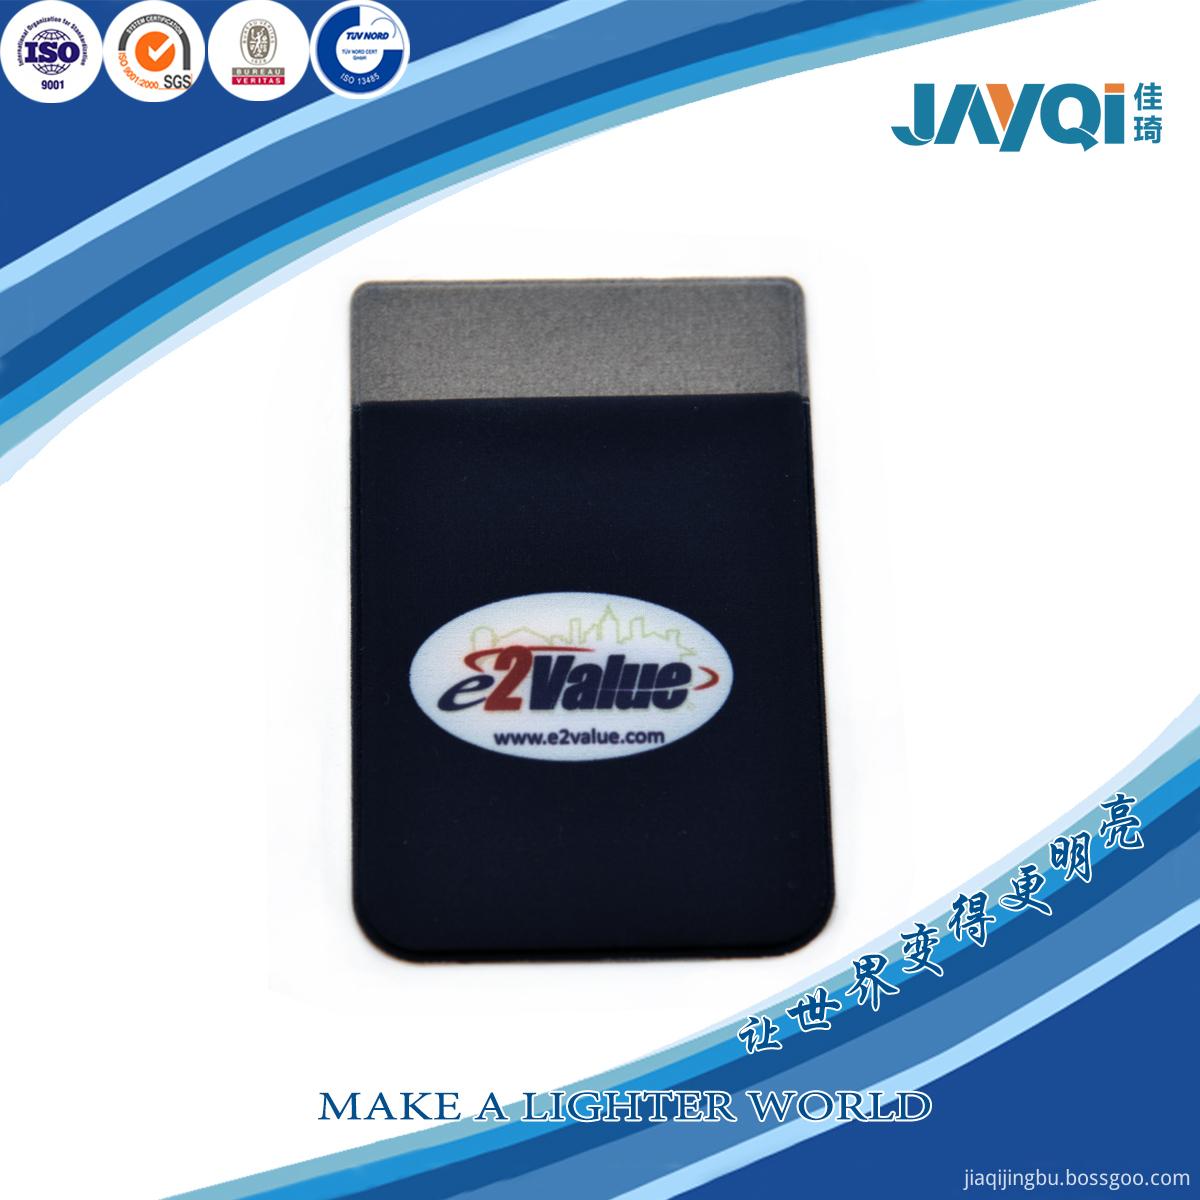 Cell Phone Credit Card Holder Smart Wallet